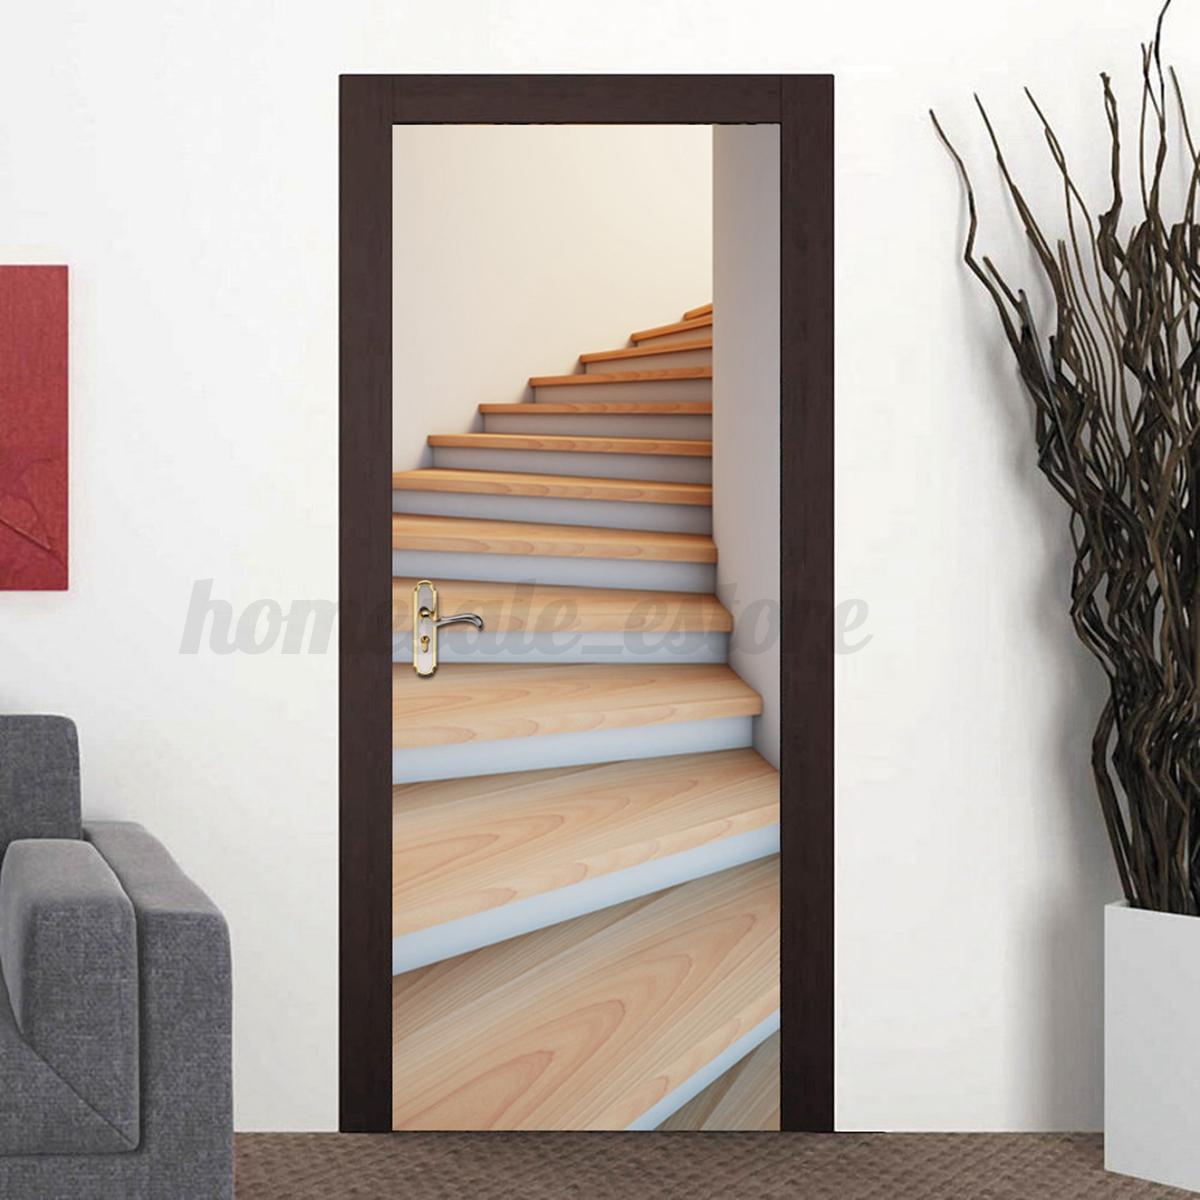 3d pvc self adhesive door wall sticker living room forest. Black Bedroom Furniture Sets. Home Design Ideas